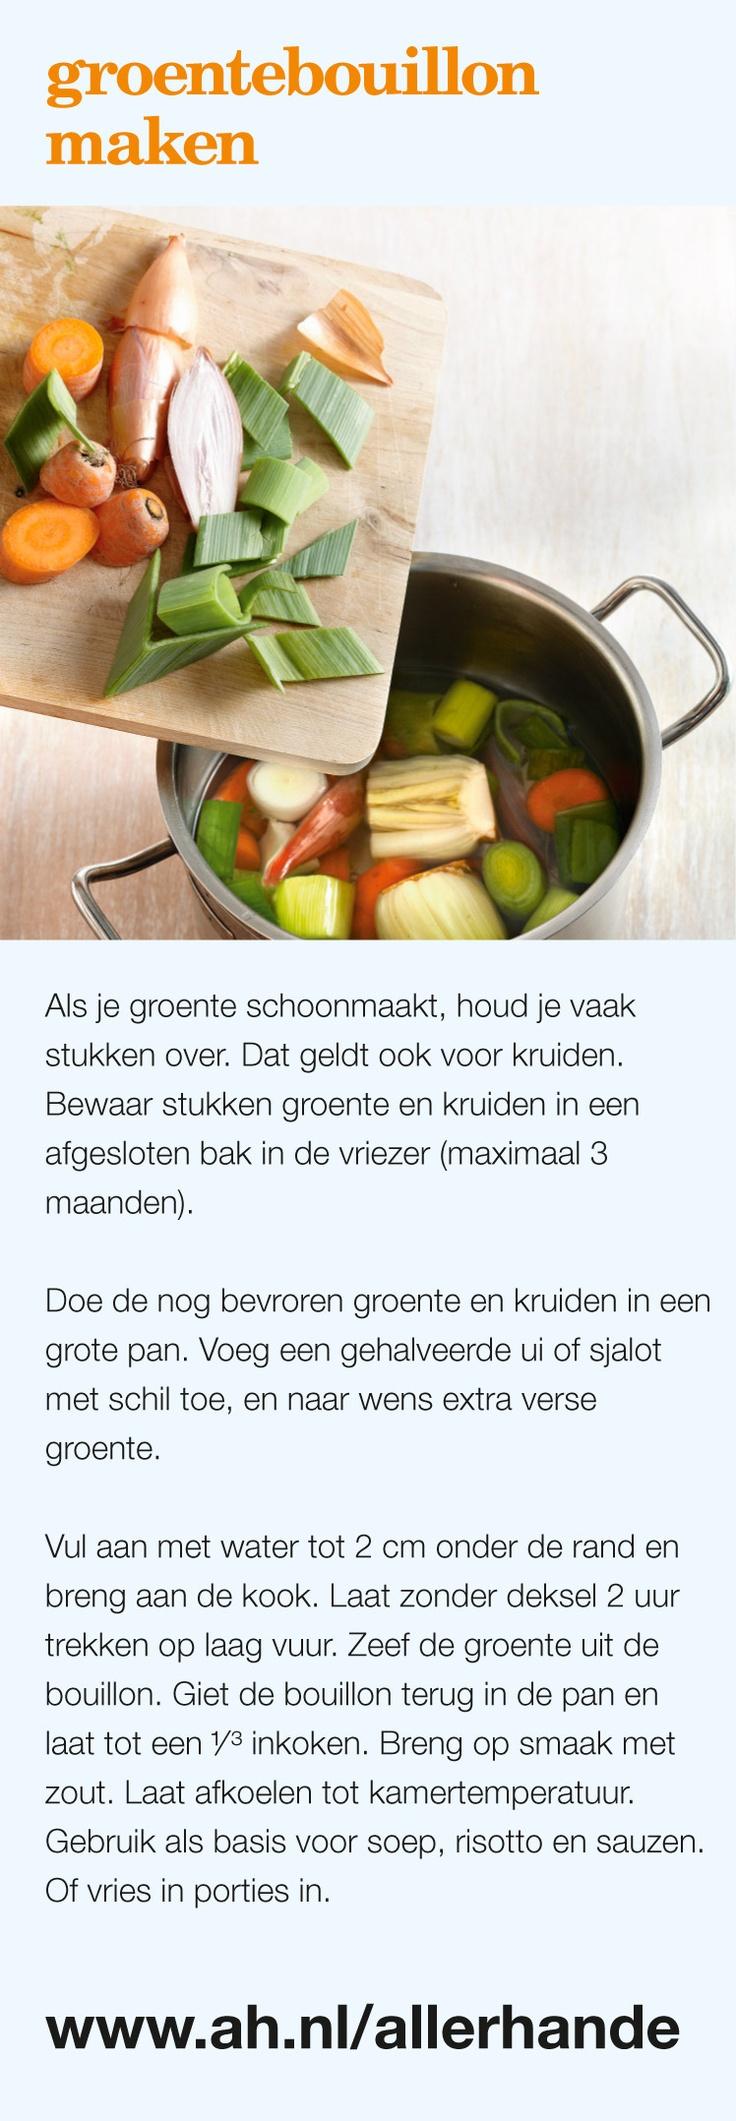 Zo maak je groentebouillon